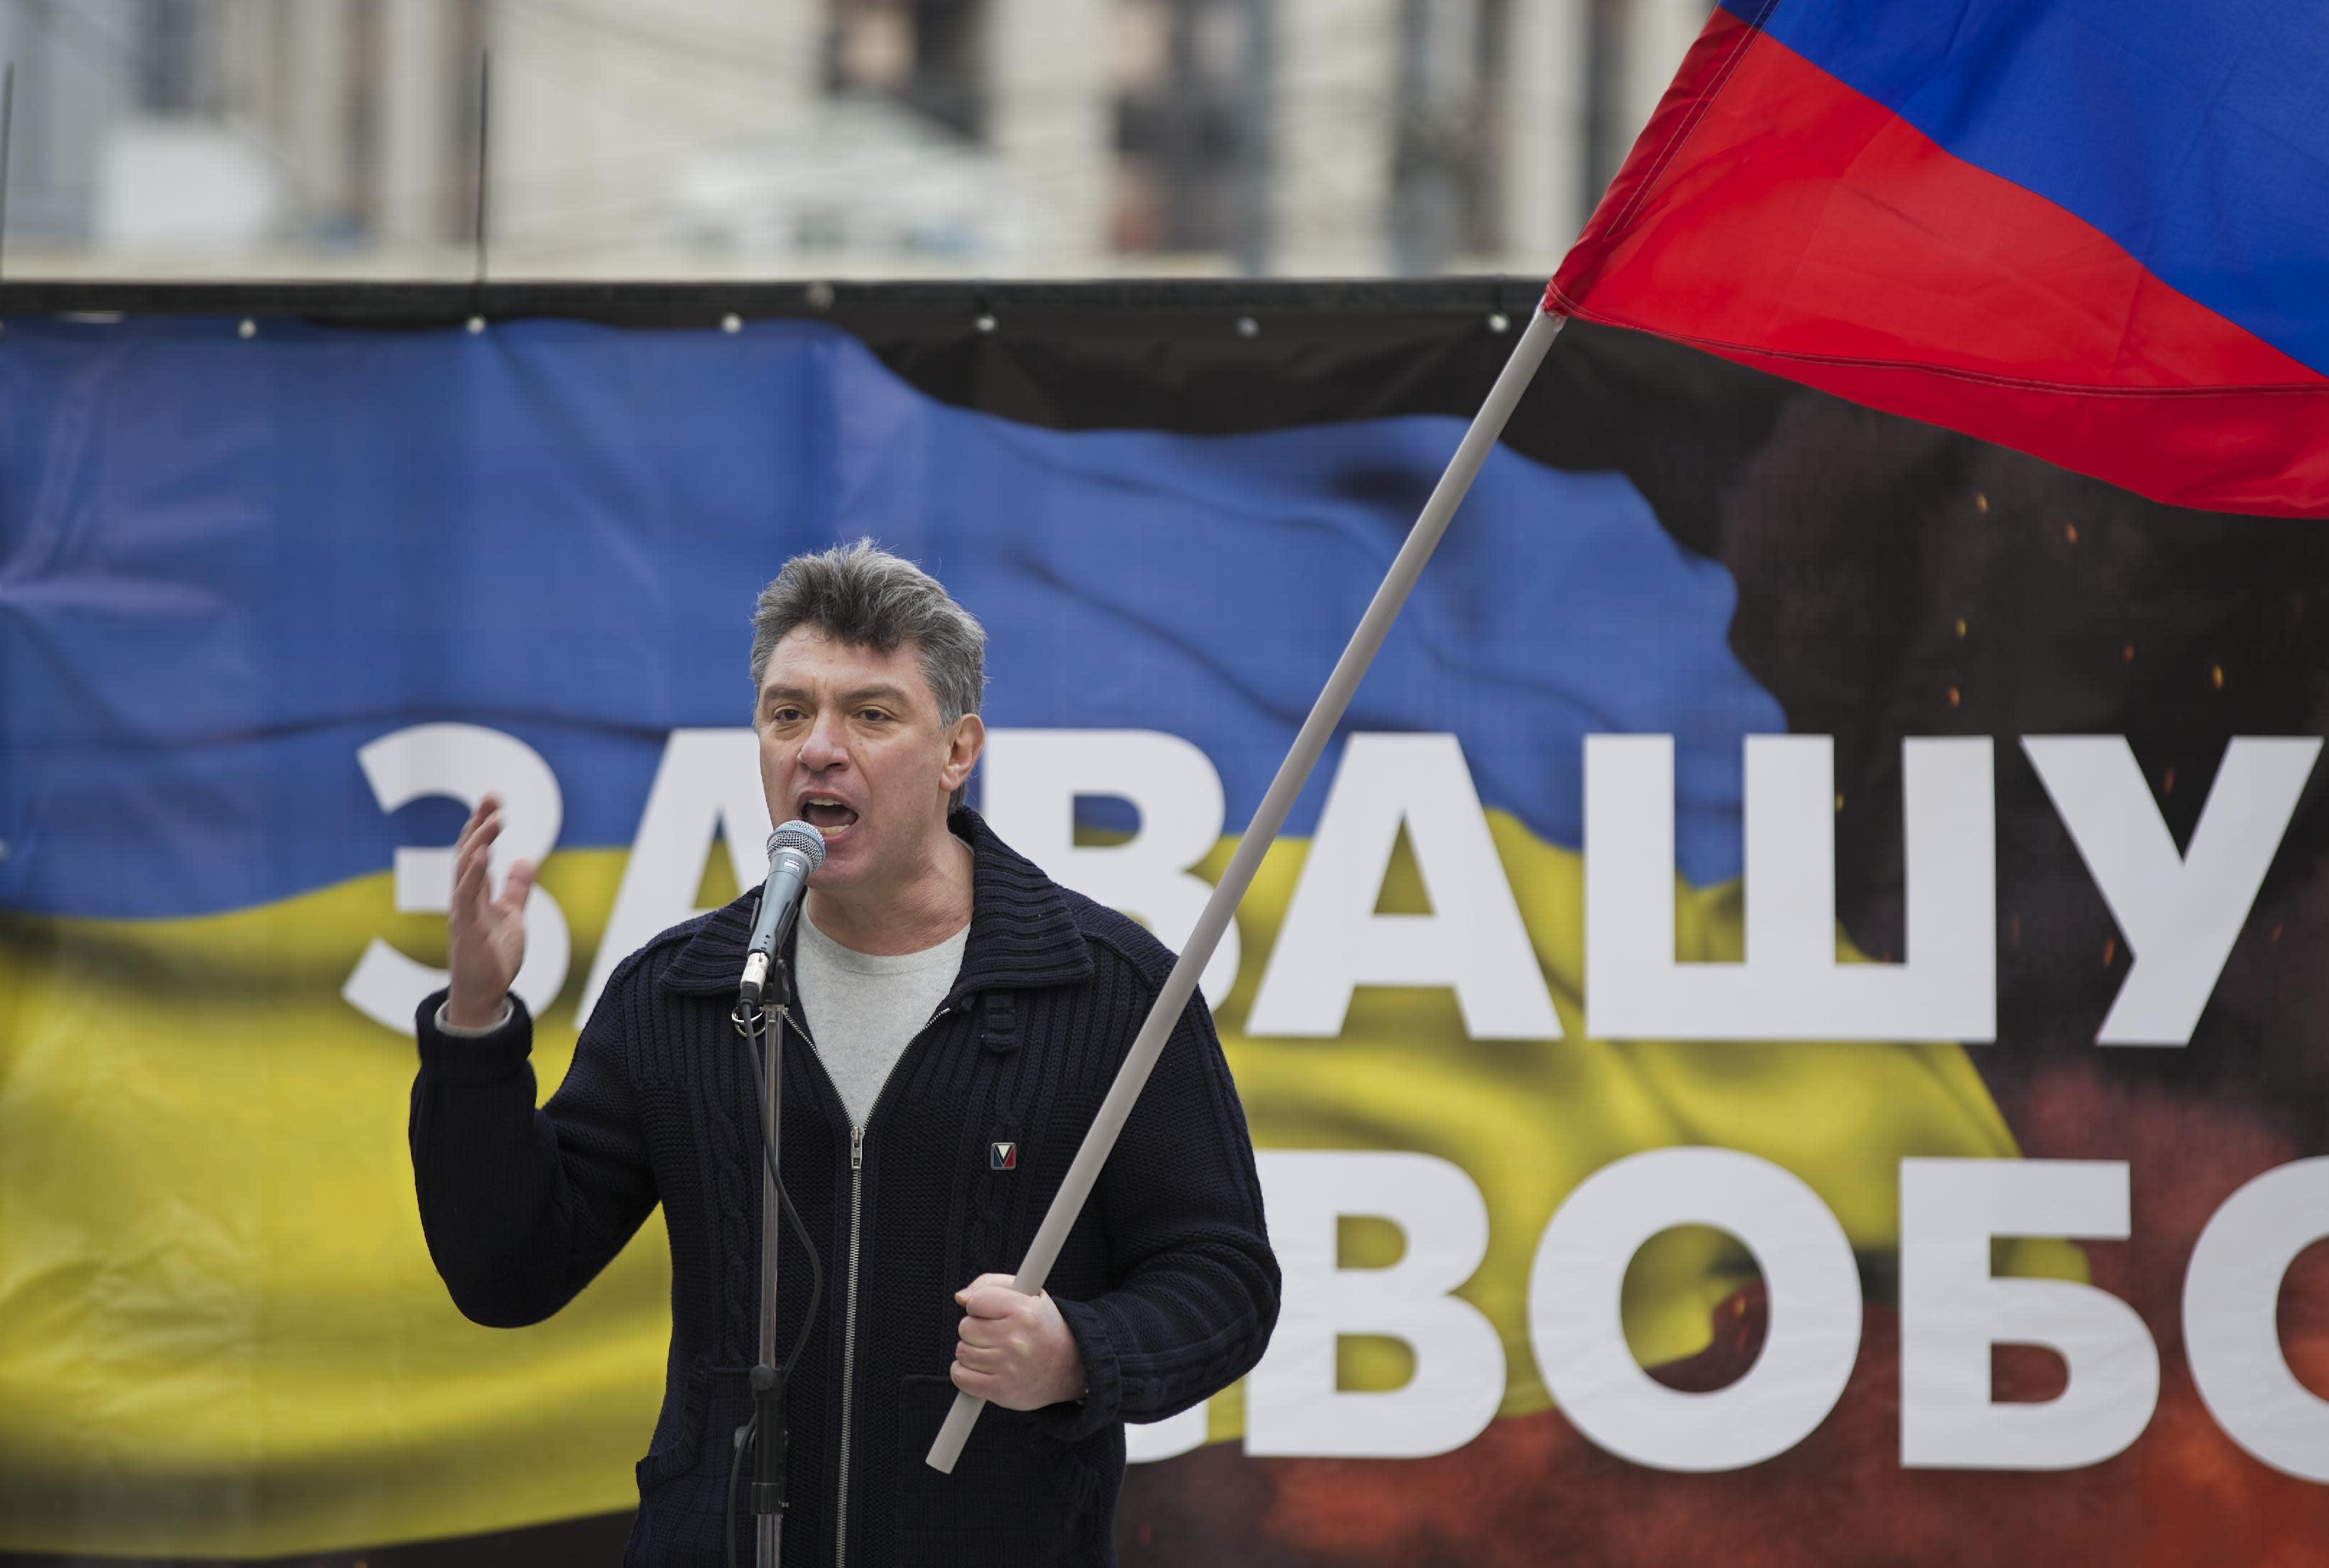 Boris Nemtsov, a Putin critic, gunned down in Moscow